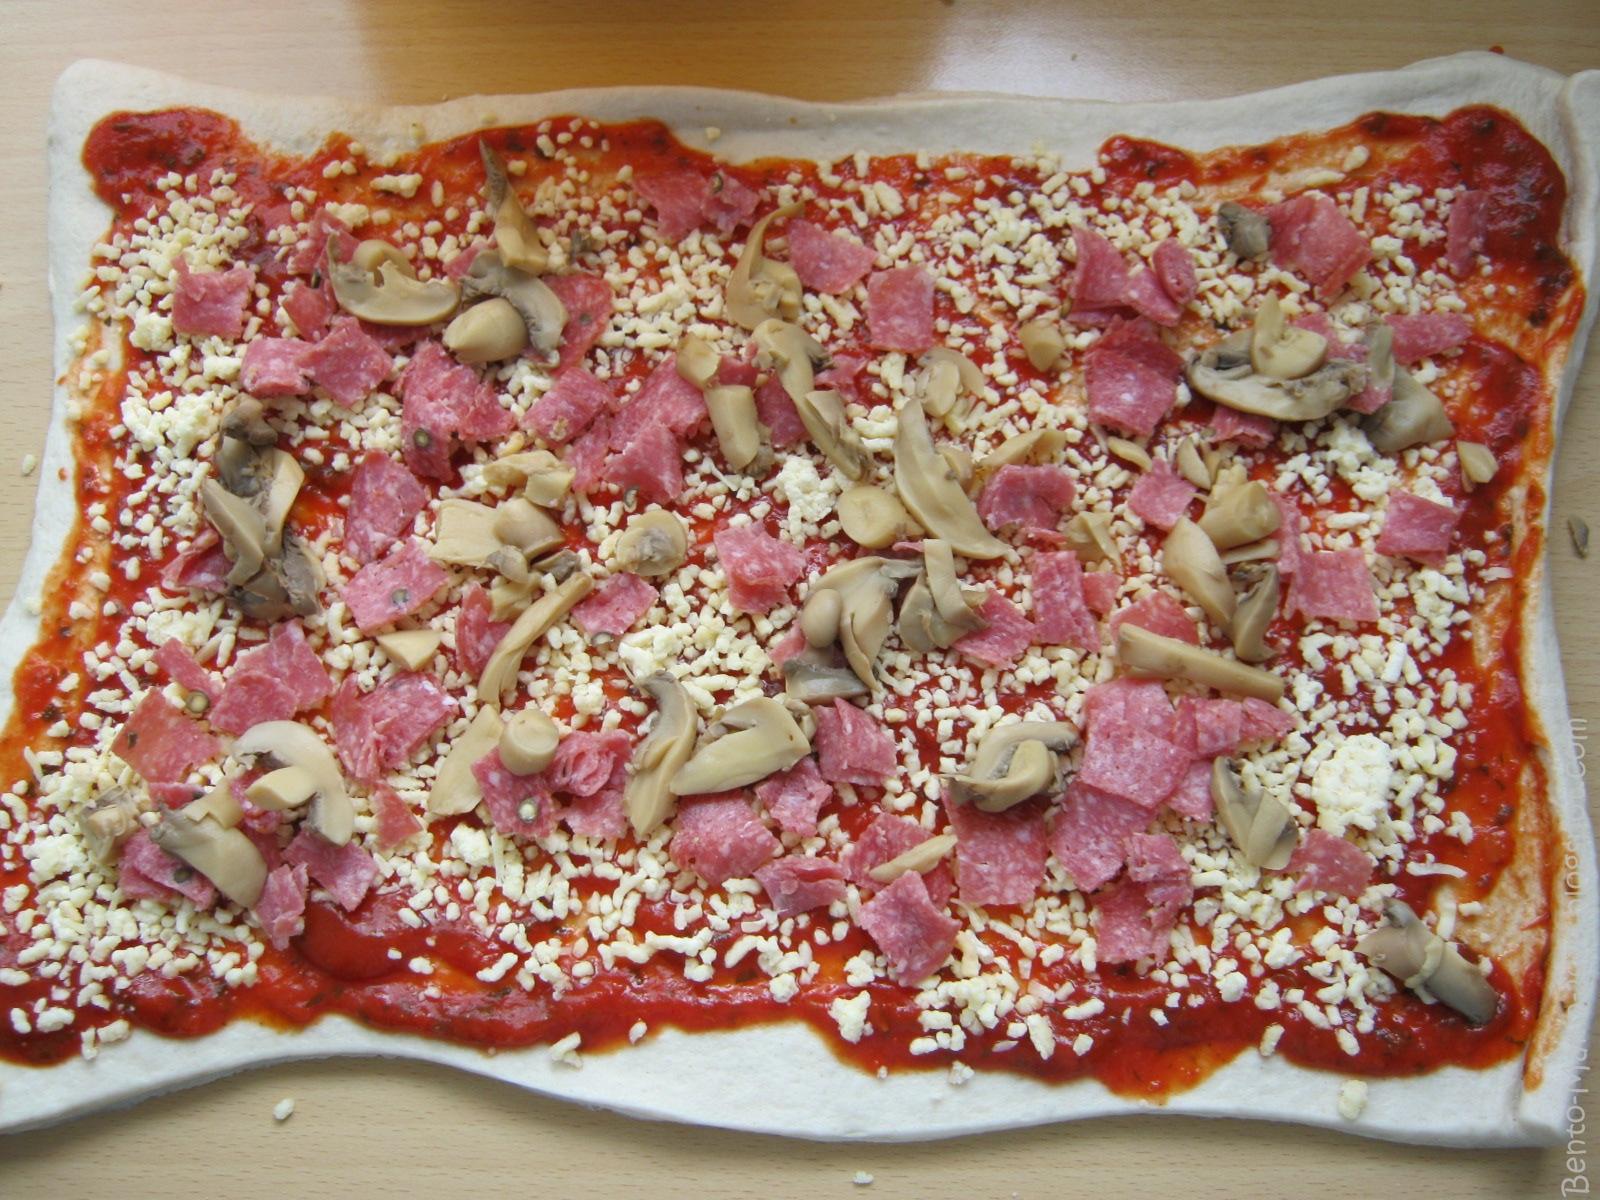 Kühlschrank Pizza Aldi : Im test lizza low carb pizza einfach low carb rezepte und mehr